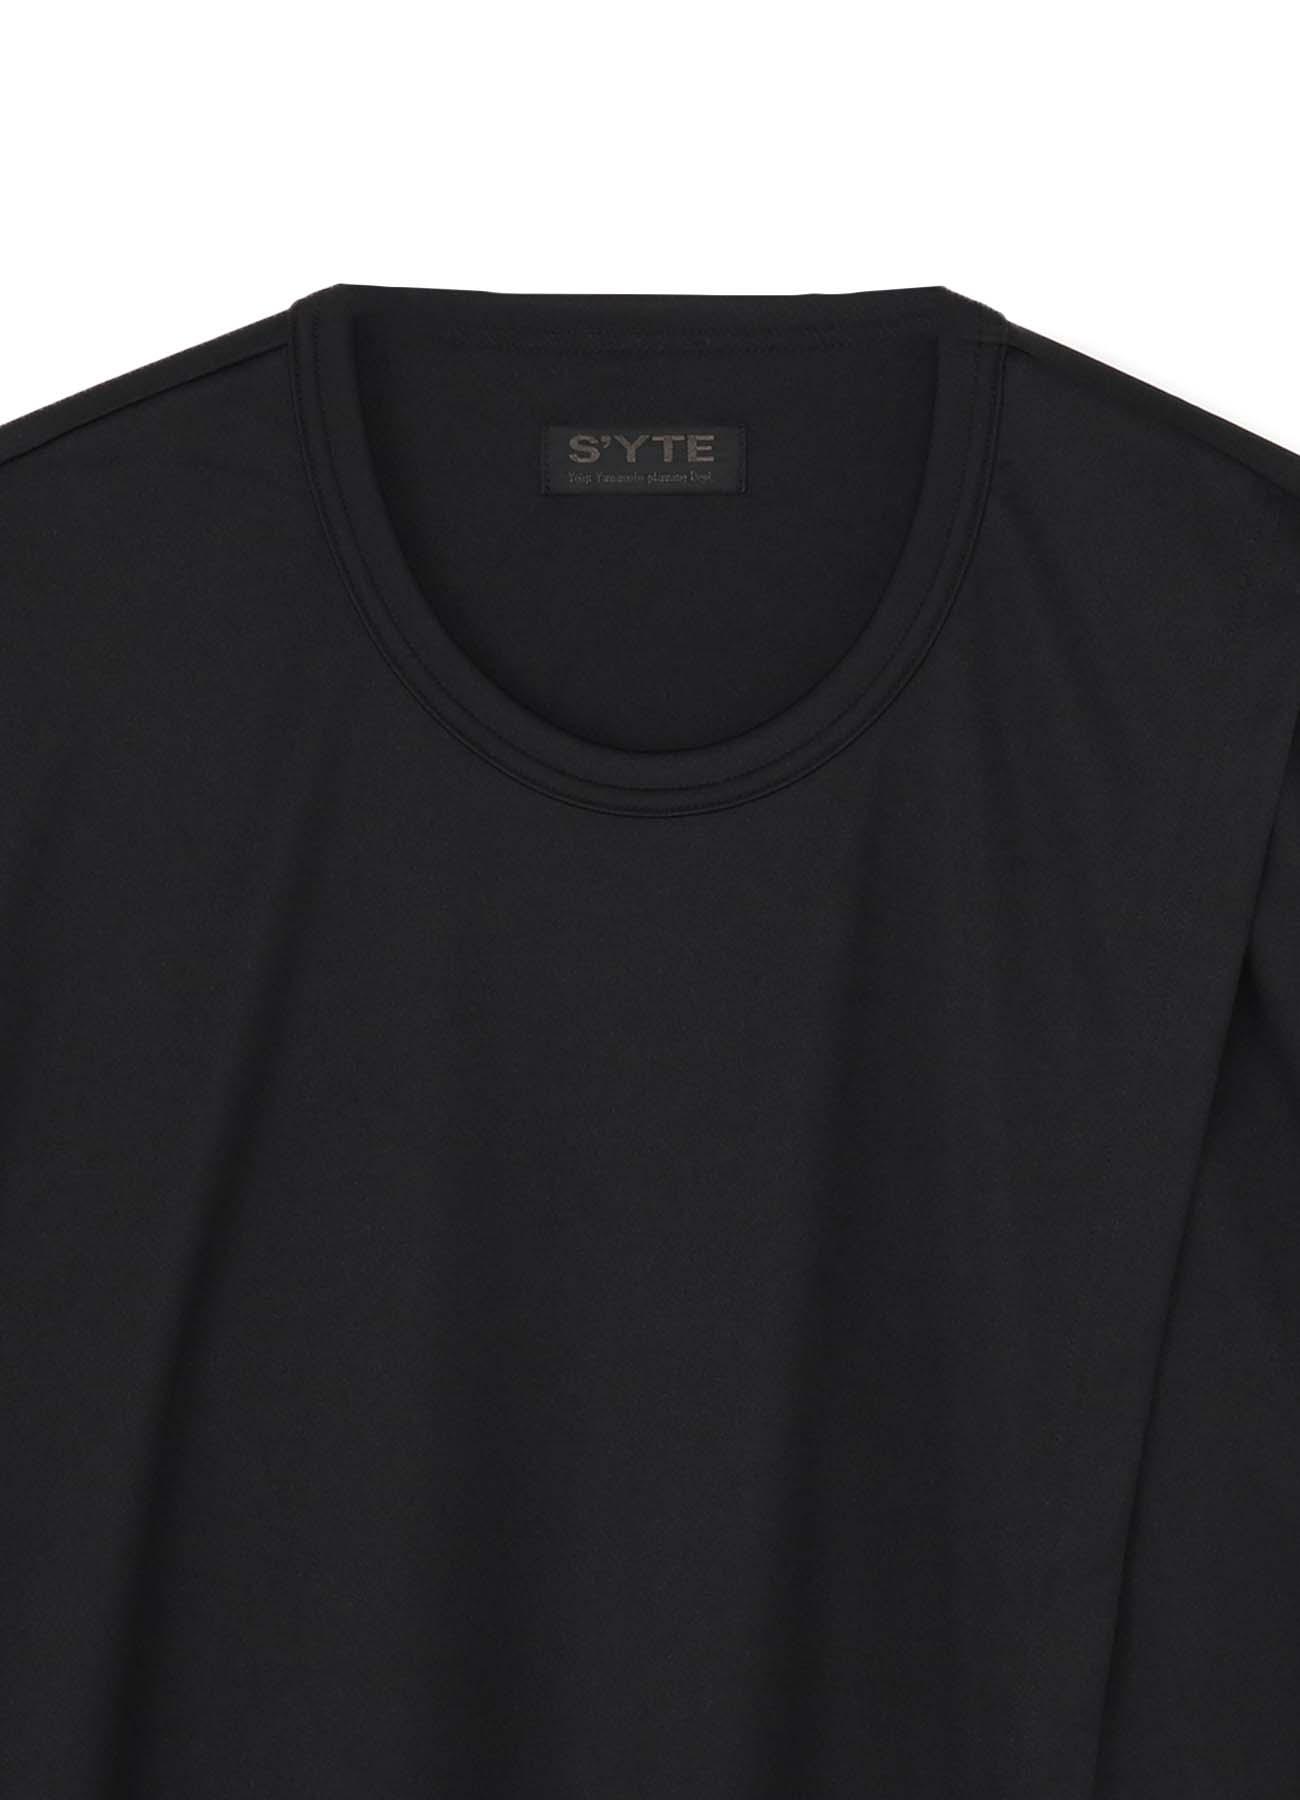 Thin Smooth Jersey Layered T-Shirt